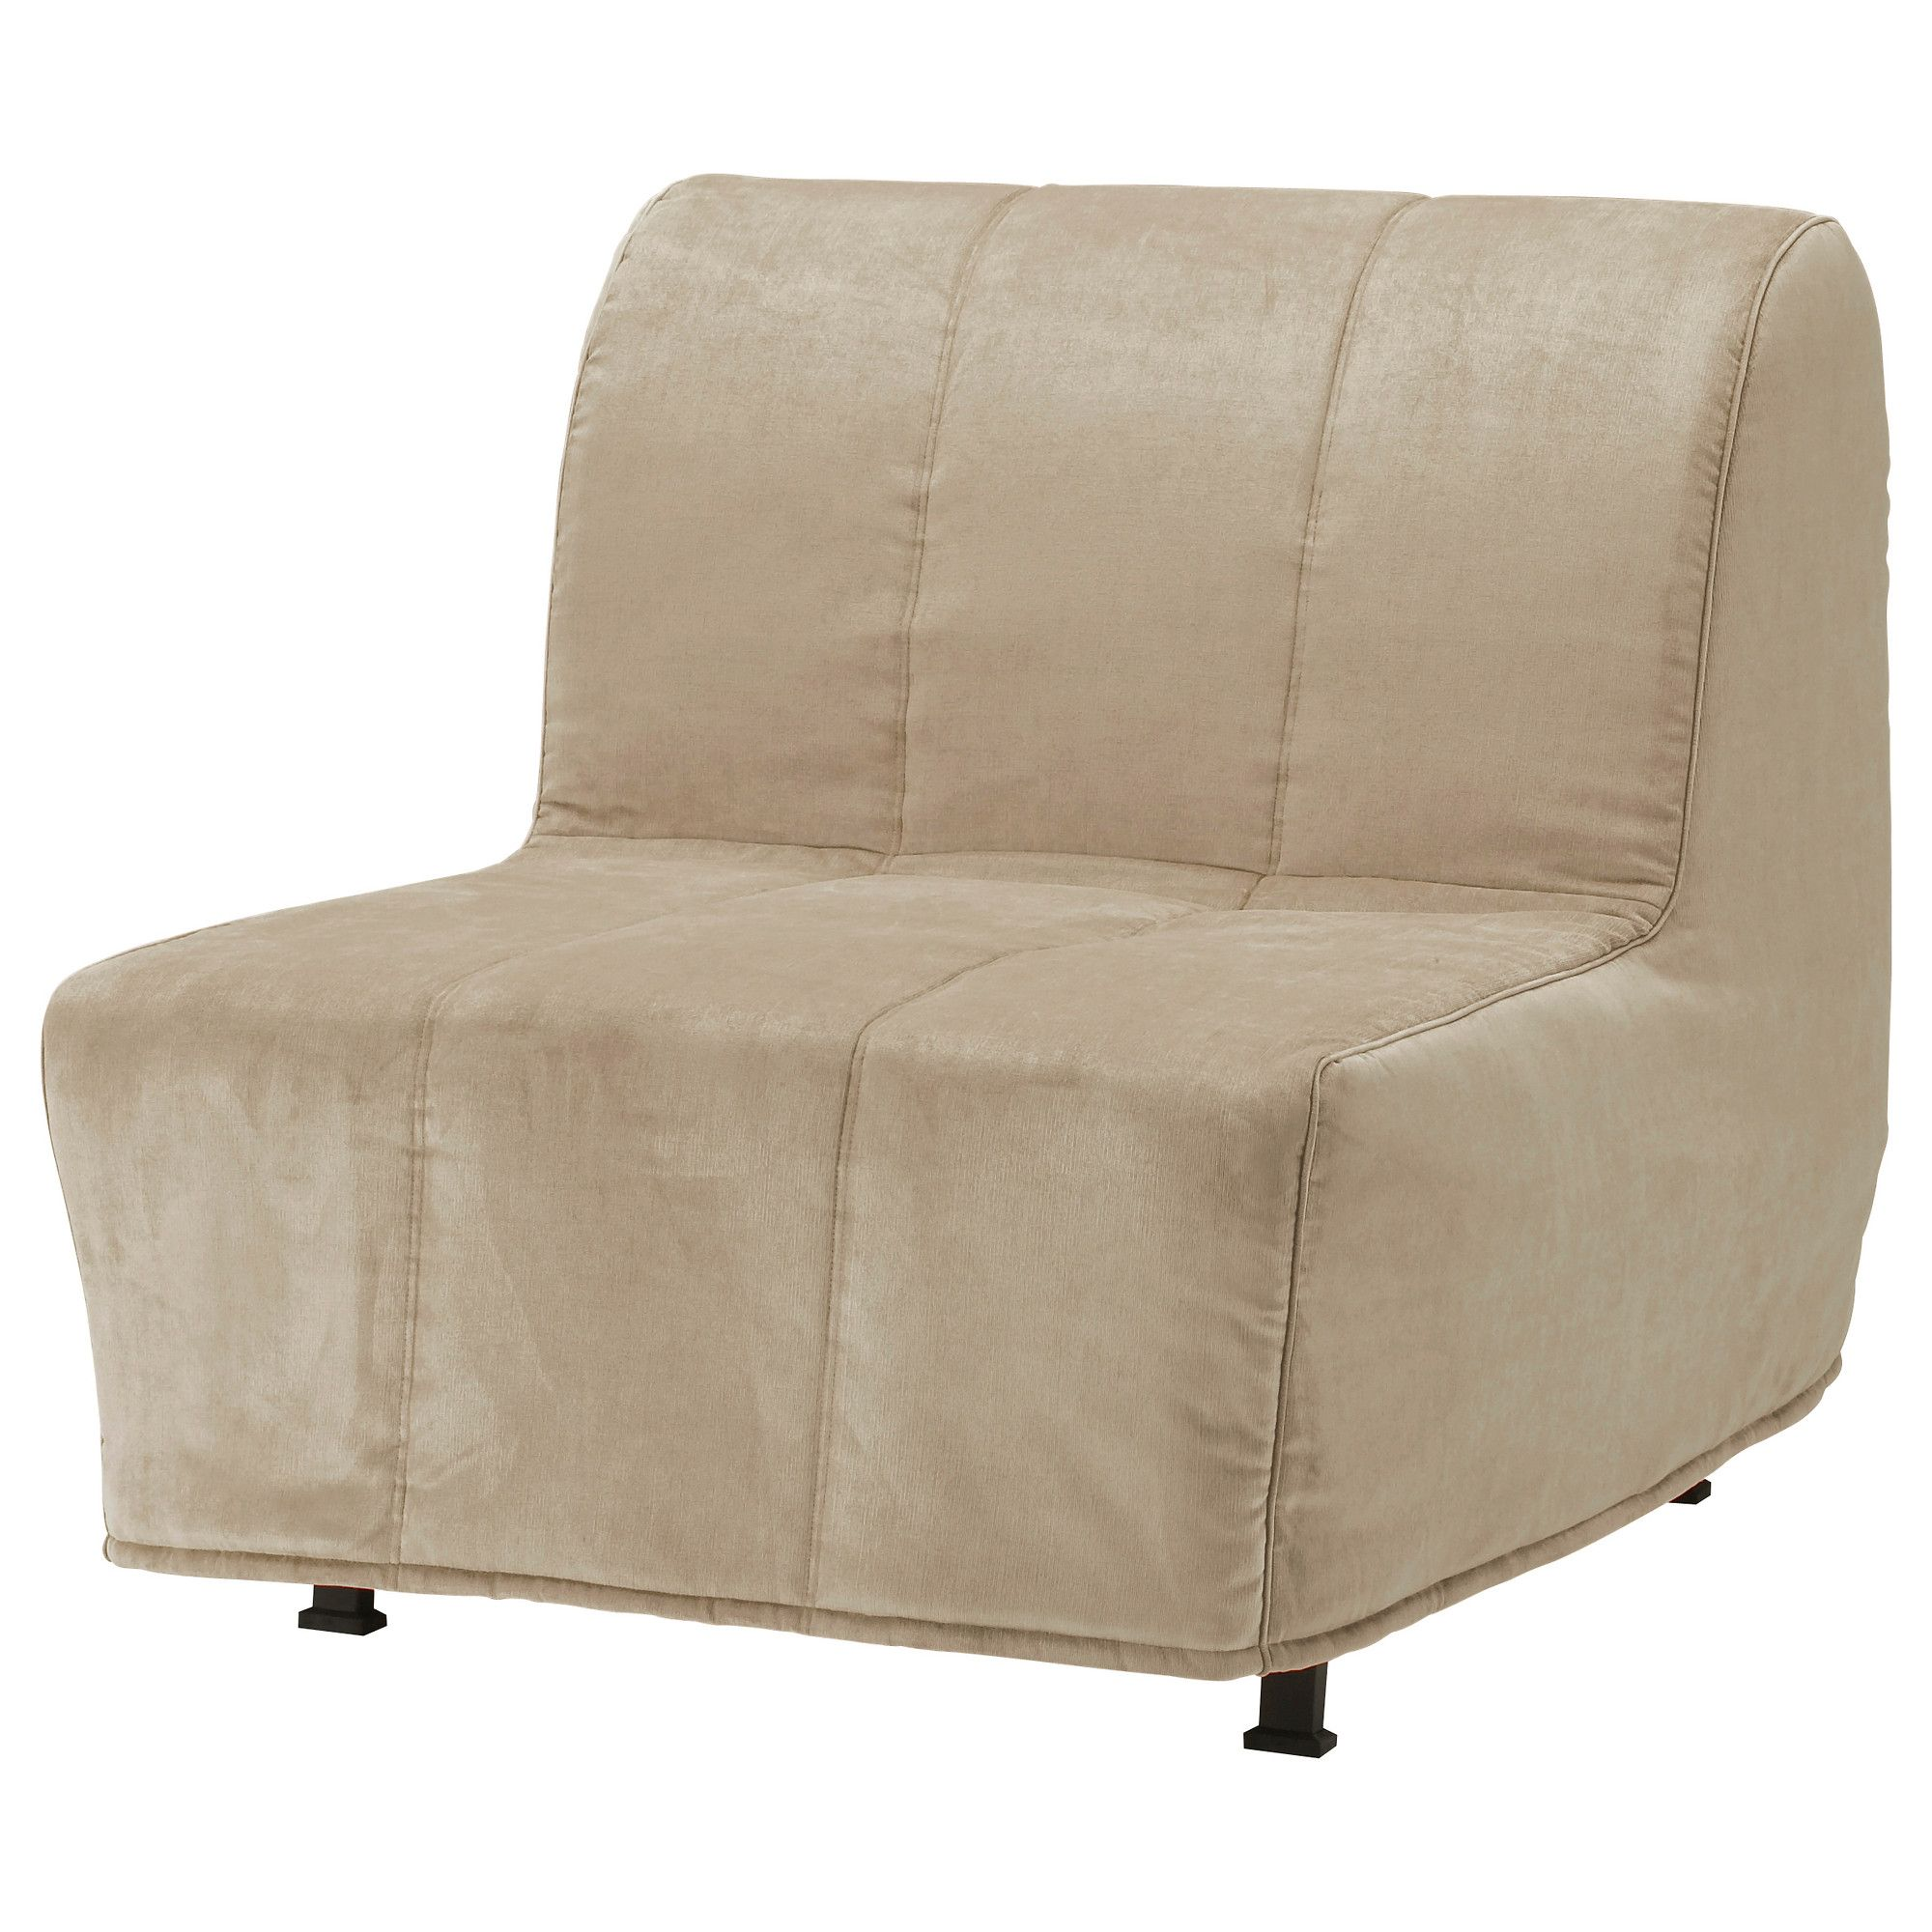 ikea lycksele sofa bed orange inflatable sofas and chairs lÖvÅs chair henån beige loft beds